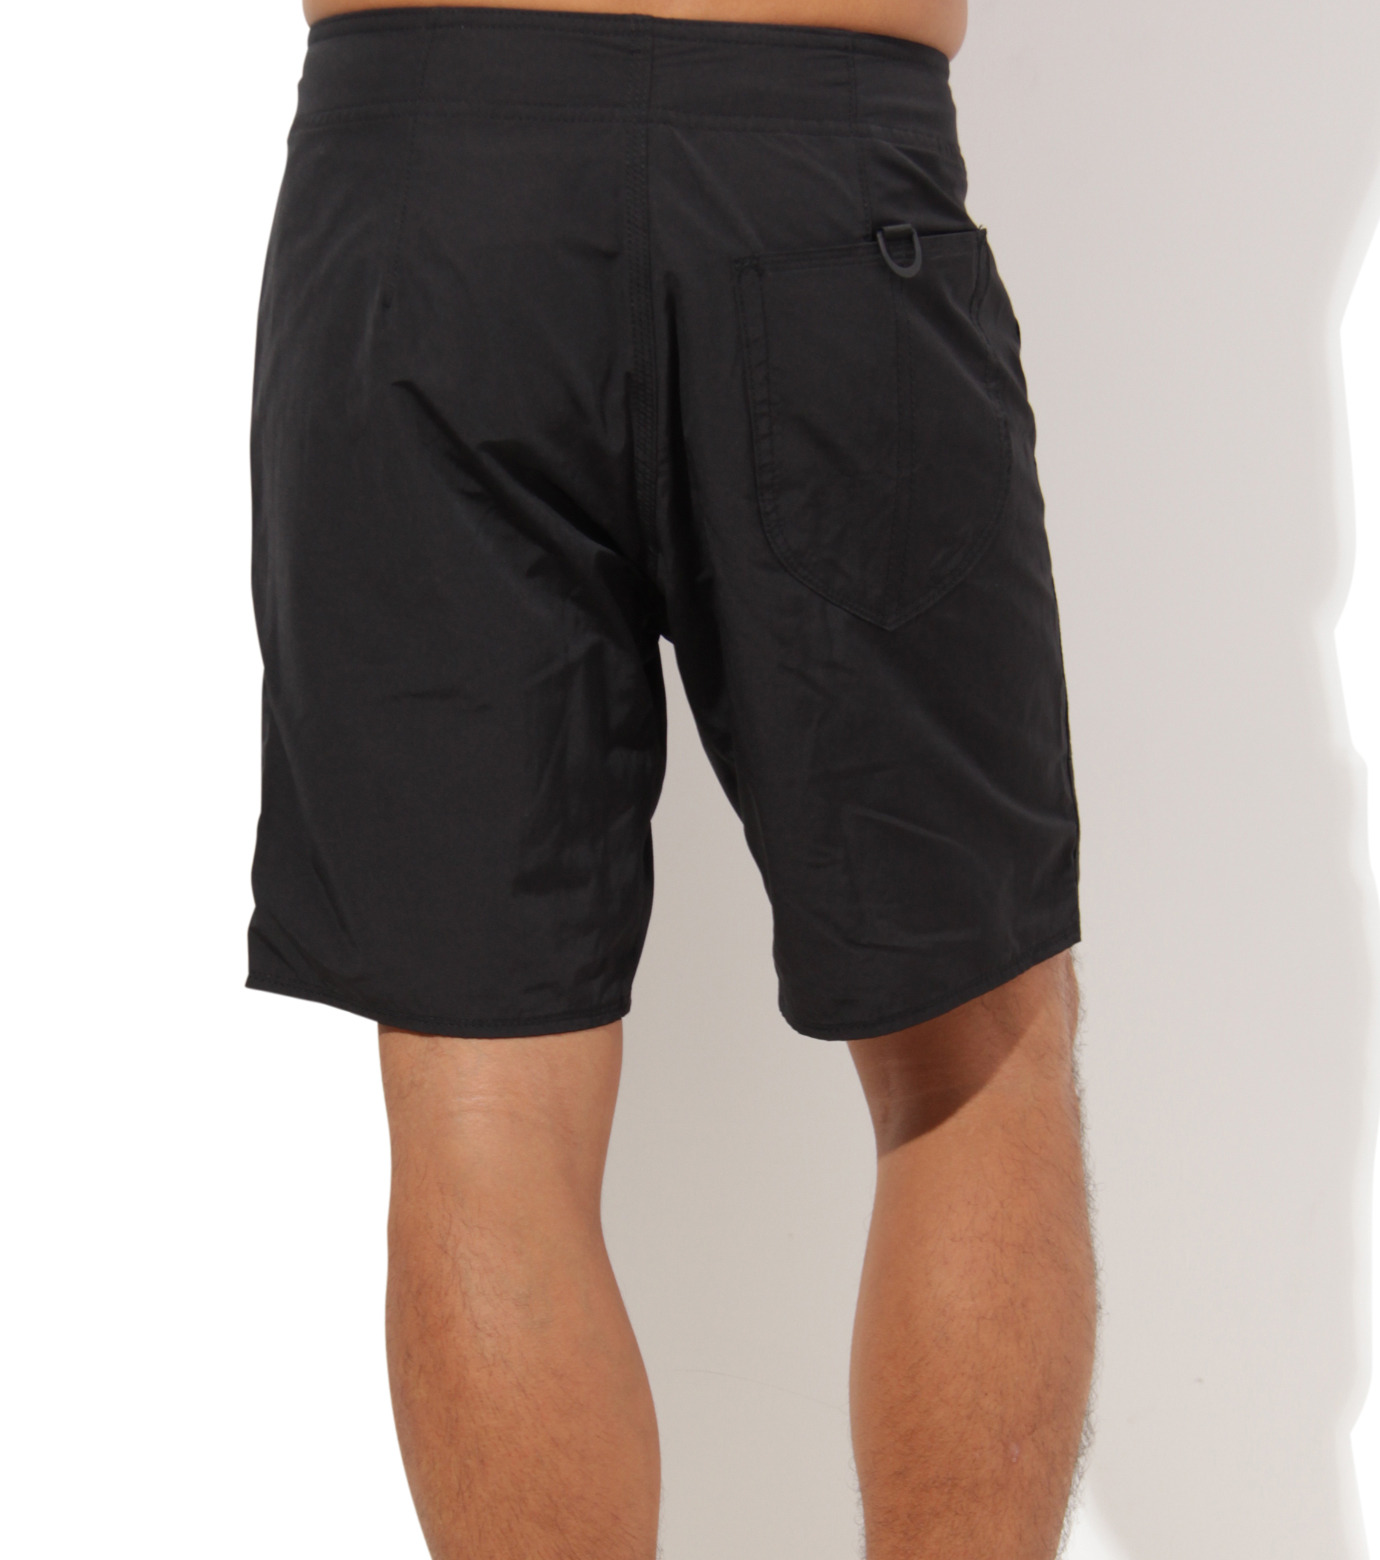 TWO TWO ONE(トゥートゥーワン)のSurf shorts short-BLACK(SWIMWEAR/SWIMWEAR)-15N948001-13 拡大詳細画像4